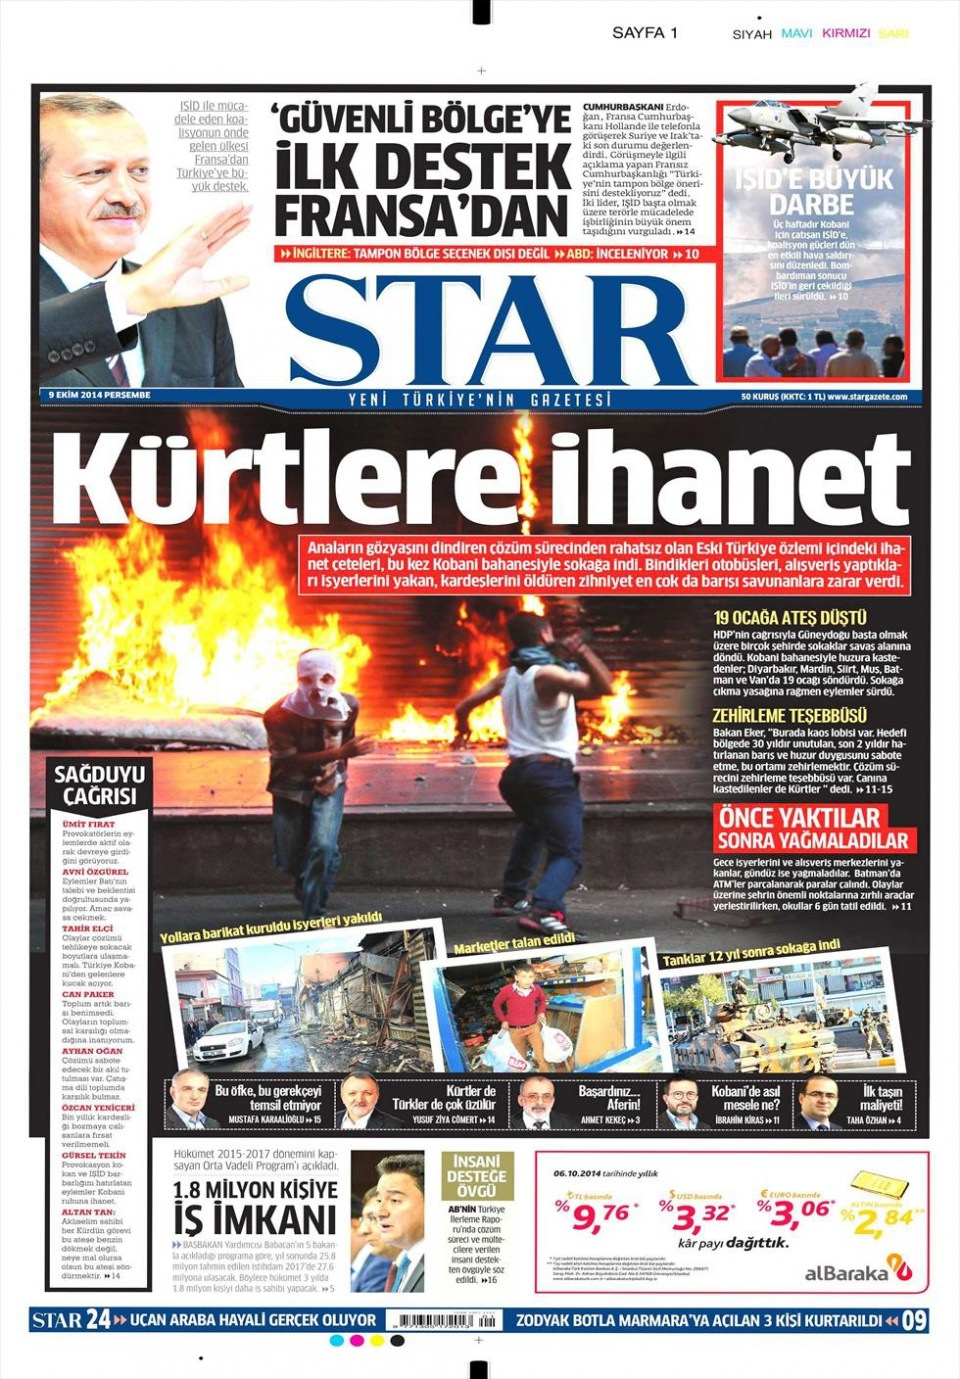 9 Ekim Gazete Manşetleri 17